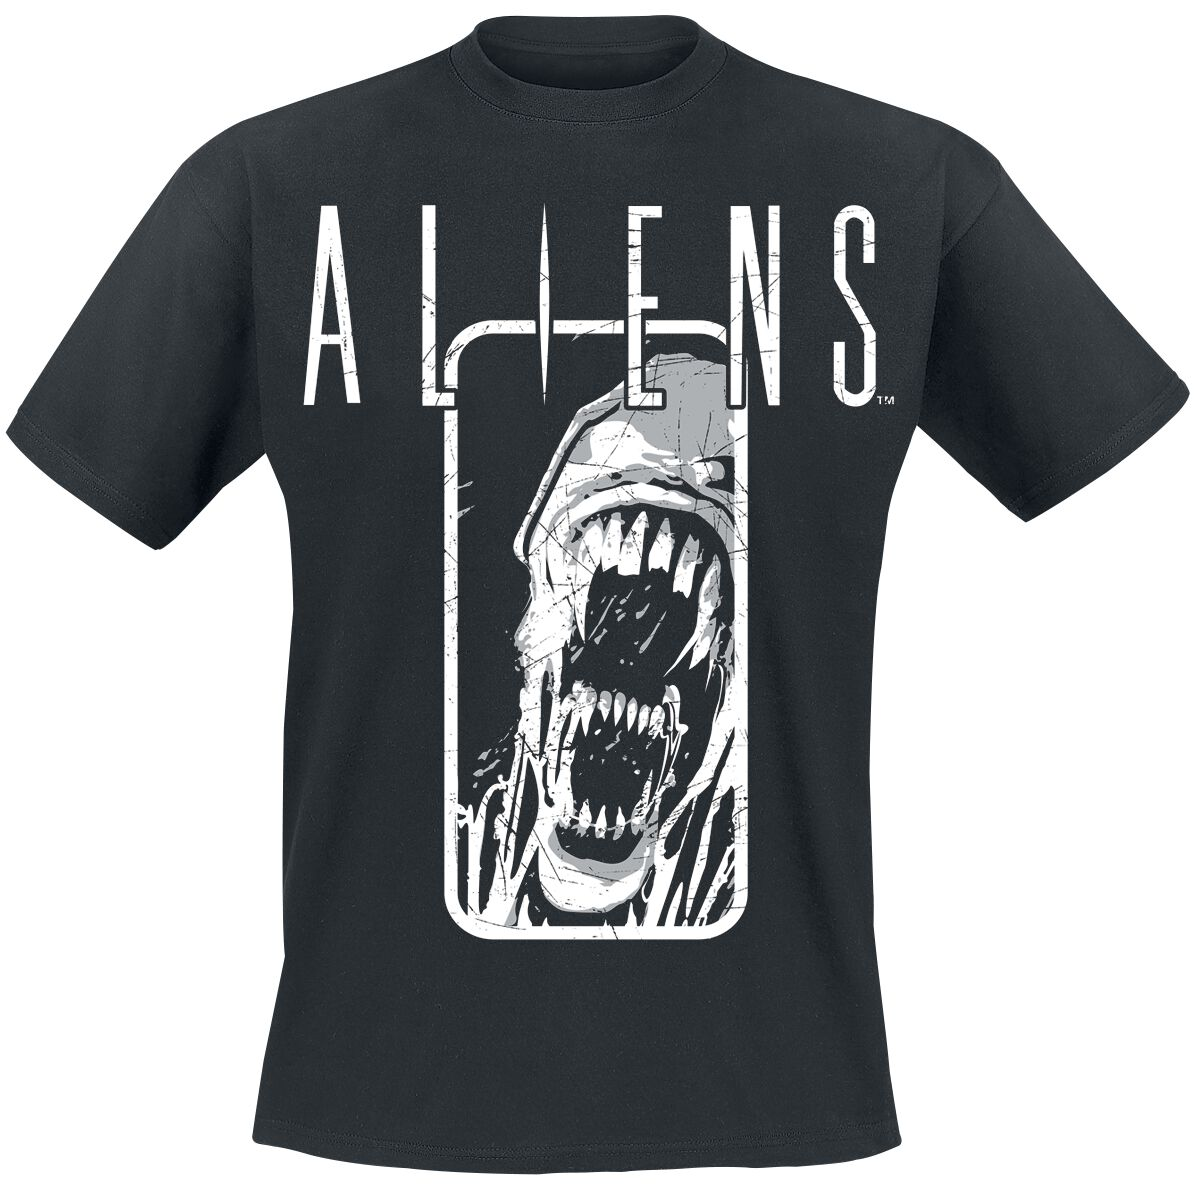 Merch dla Fanów - Koszulki - T-Shirt Alien Aliens - Distressed T-Shirt czarny - 378000